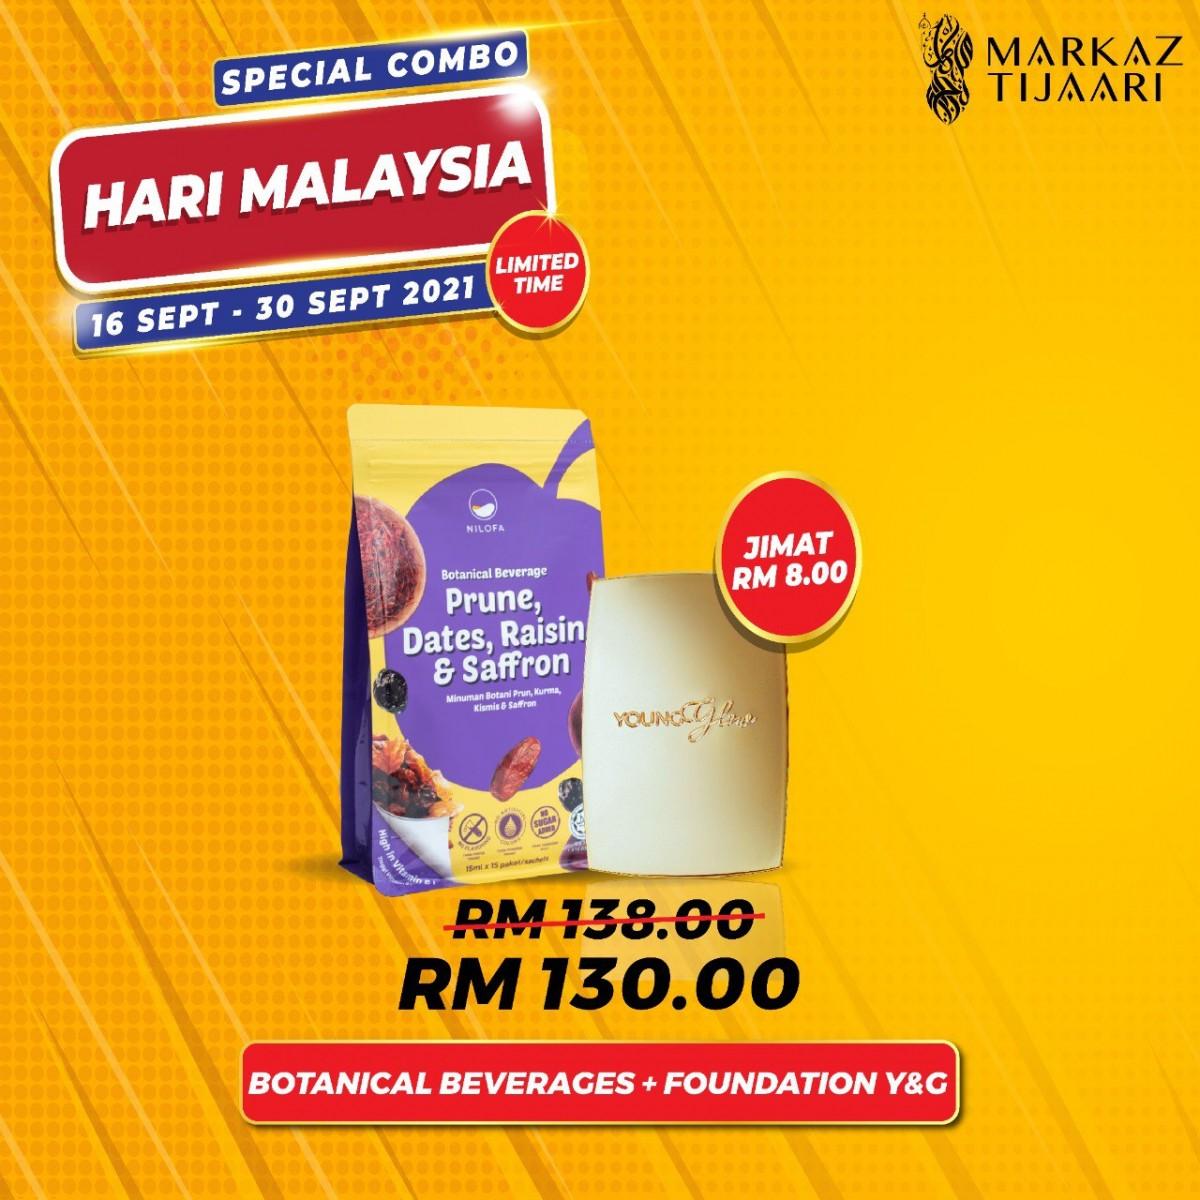 Malaysia Day Deals Foundation Young & Glow + Botanical Beverage - MARKAZ TIJAARI